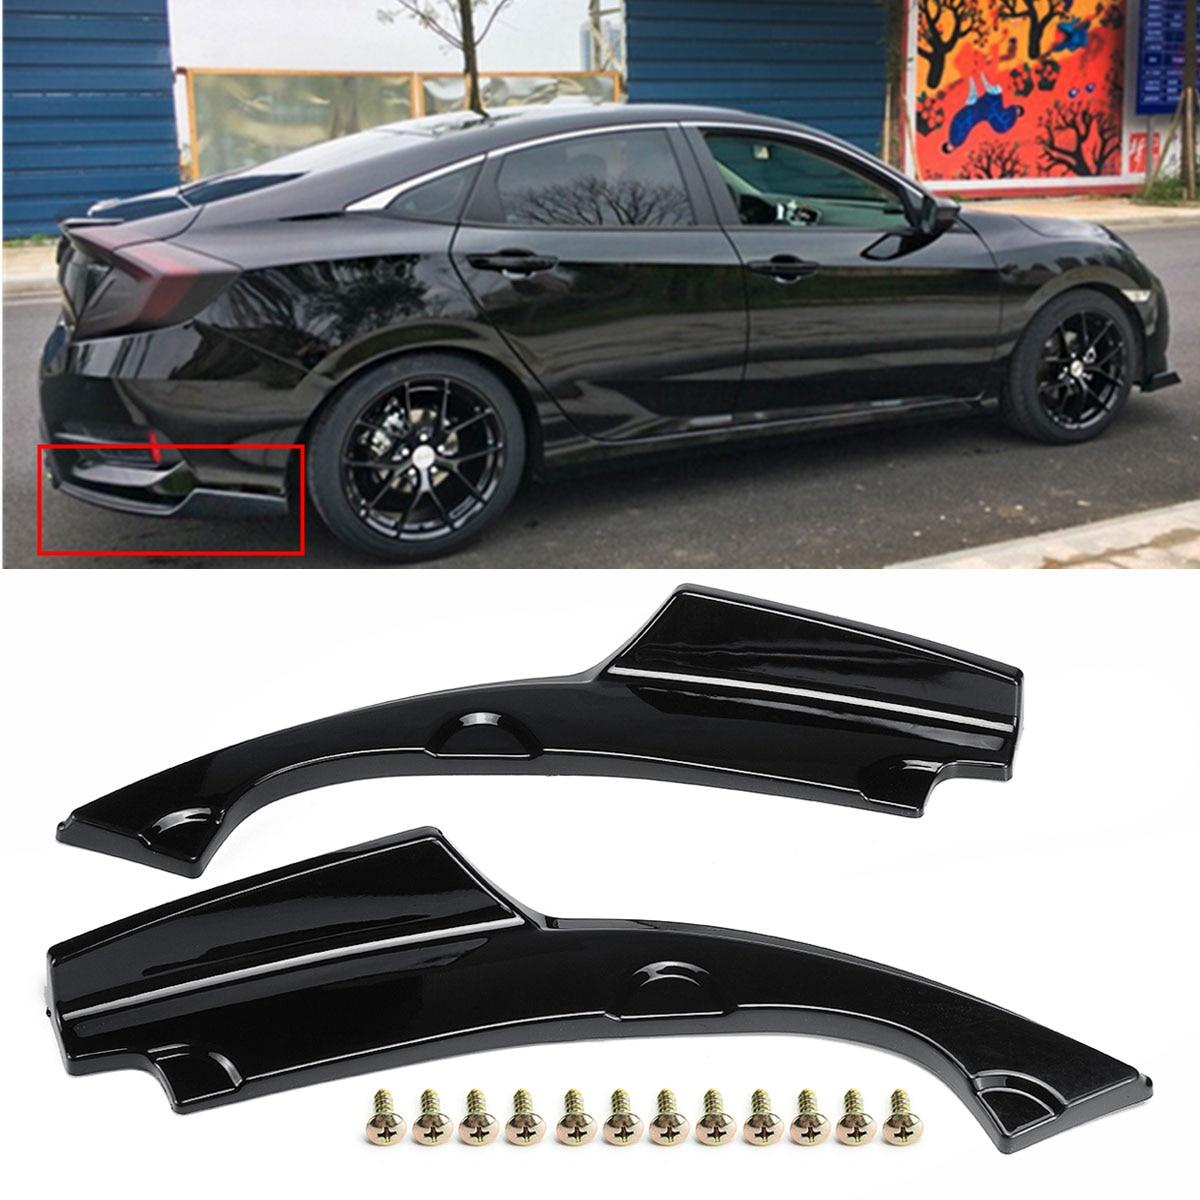 2 uds parachoques trasero de coche cubiertas de esquina inferior cenefa divisor alerones delantal esquina cenefa para Honda para Civic 4DR 2016-2018